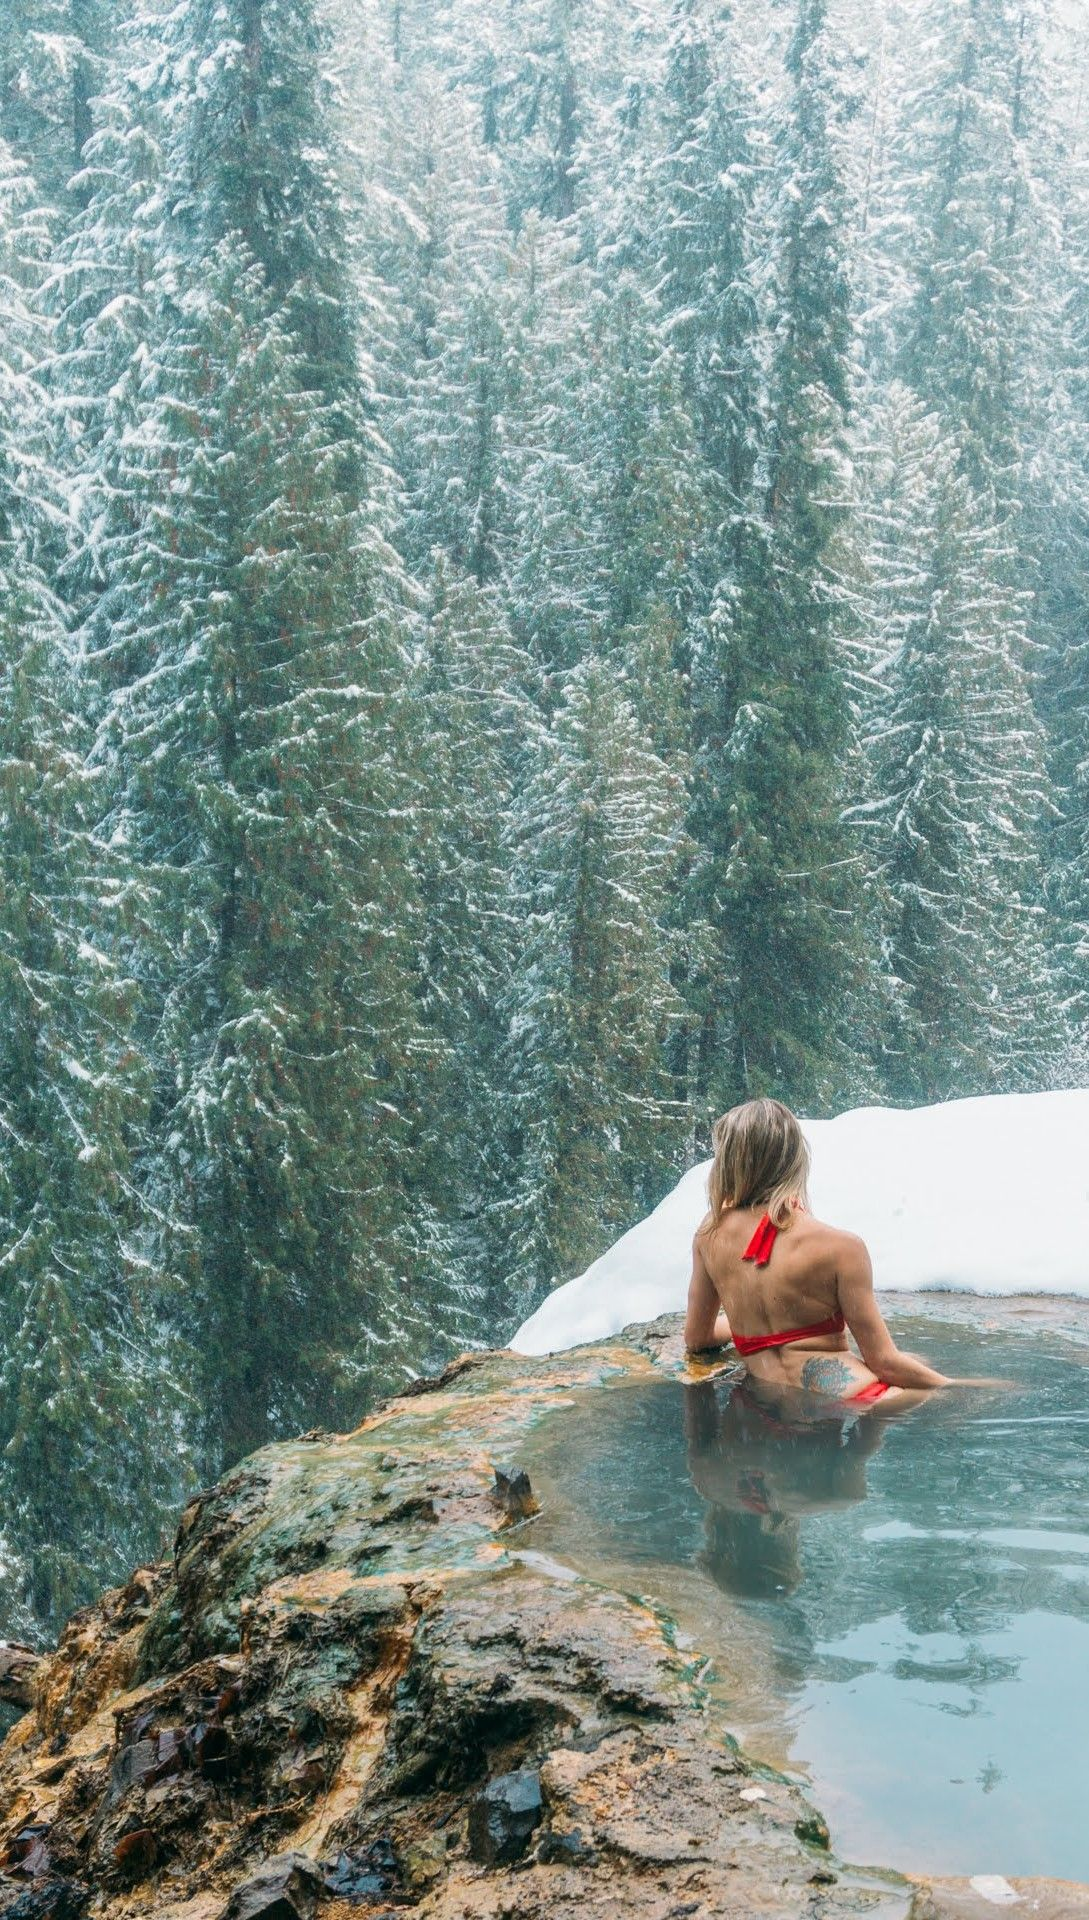 Relaxing at the hidden Umpqua hot springs in Oregon, a traveler's paradise